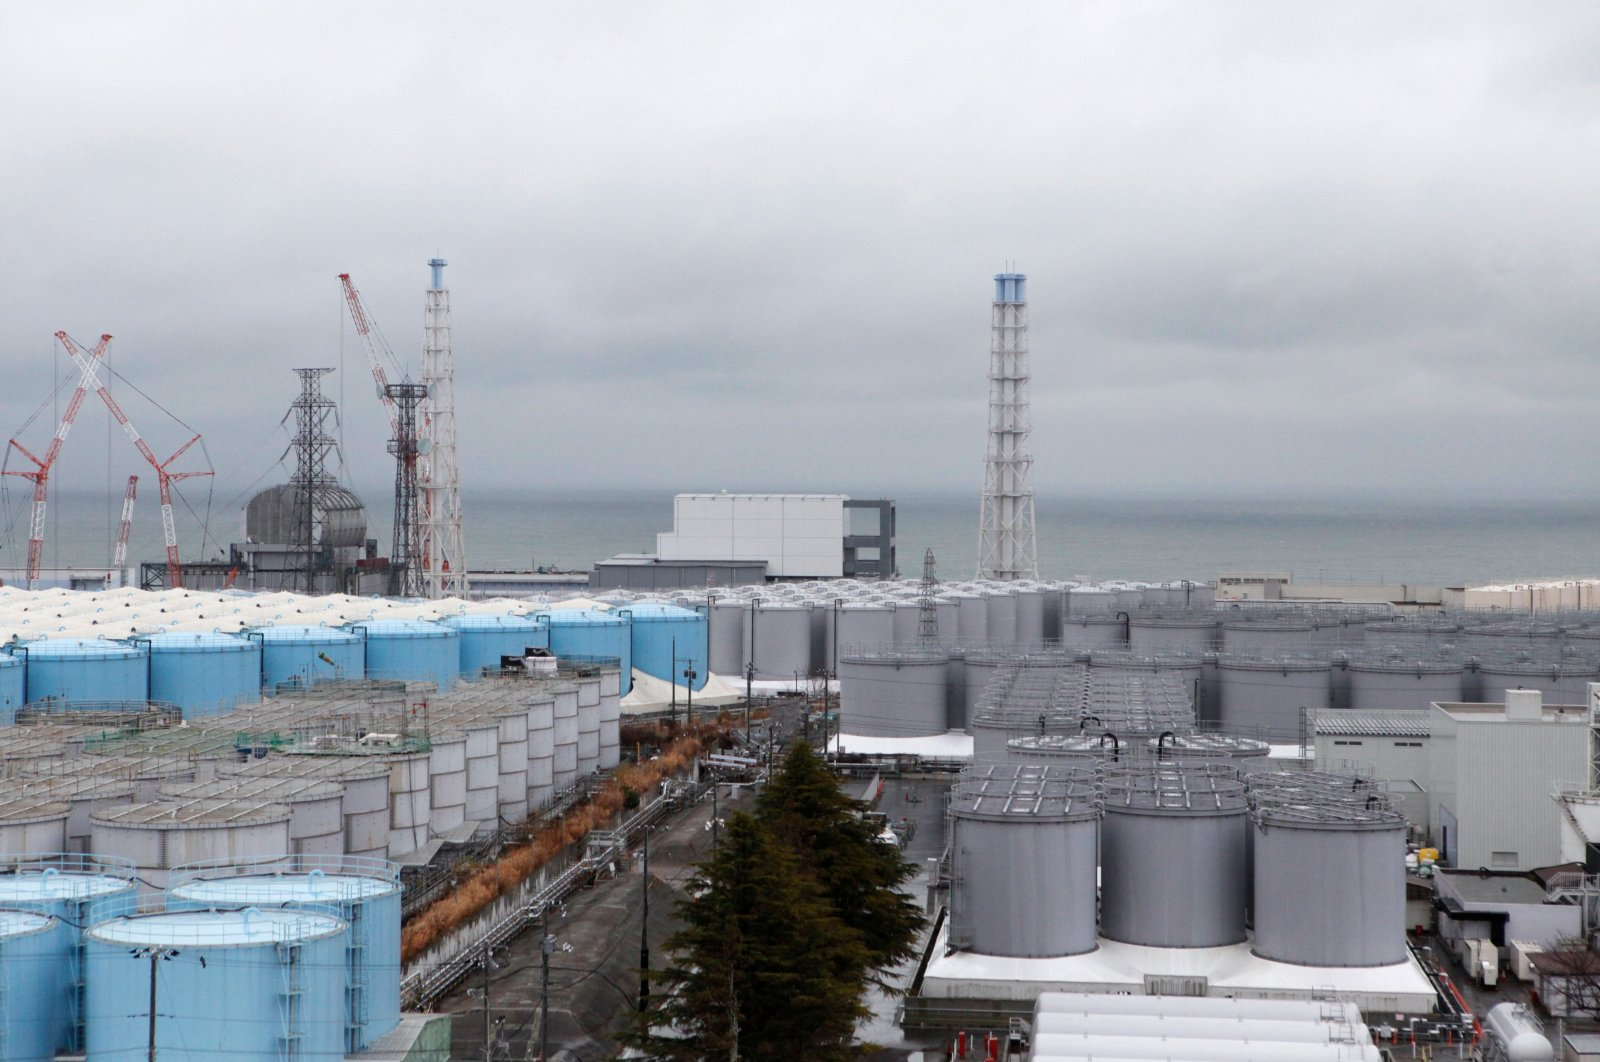 Storage tanks for radioactive water are seen at Tokyo Electric Power Company Holdings Inc.'s (TEPCO) tsunami-crippled Fukushima Daiichi nuclear power plant in the town of Okuma, Fukushima prefecture, Japan, Jan. 15, 2020. (Reuters Photo)